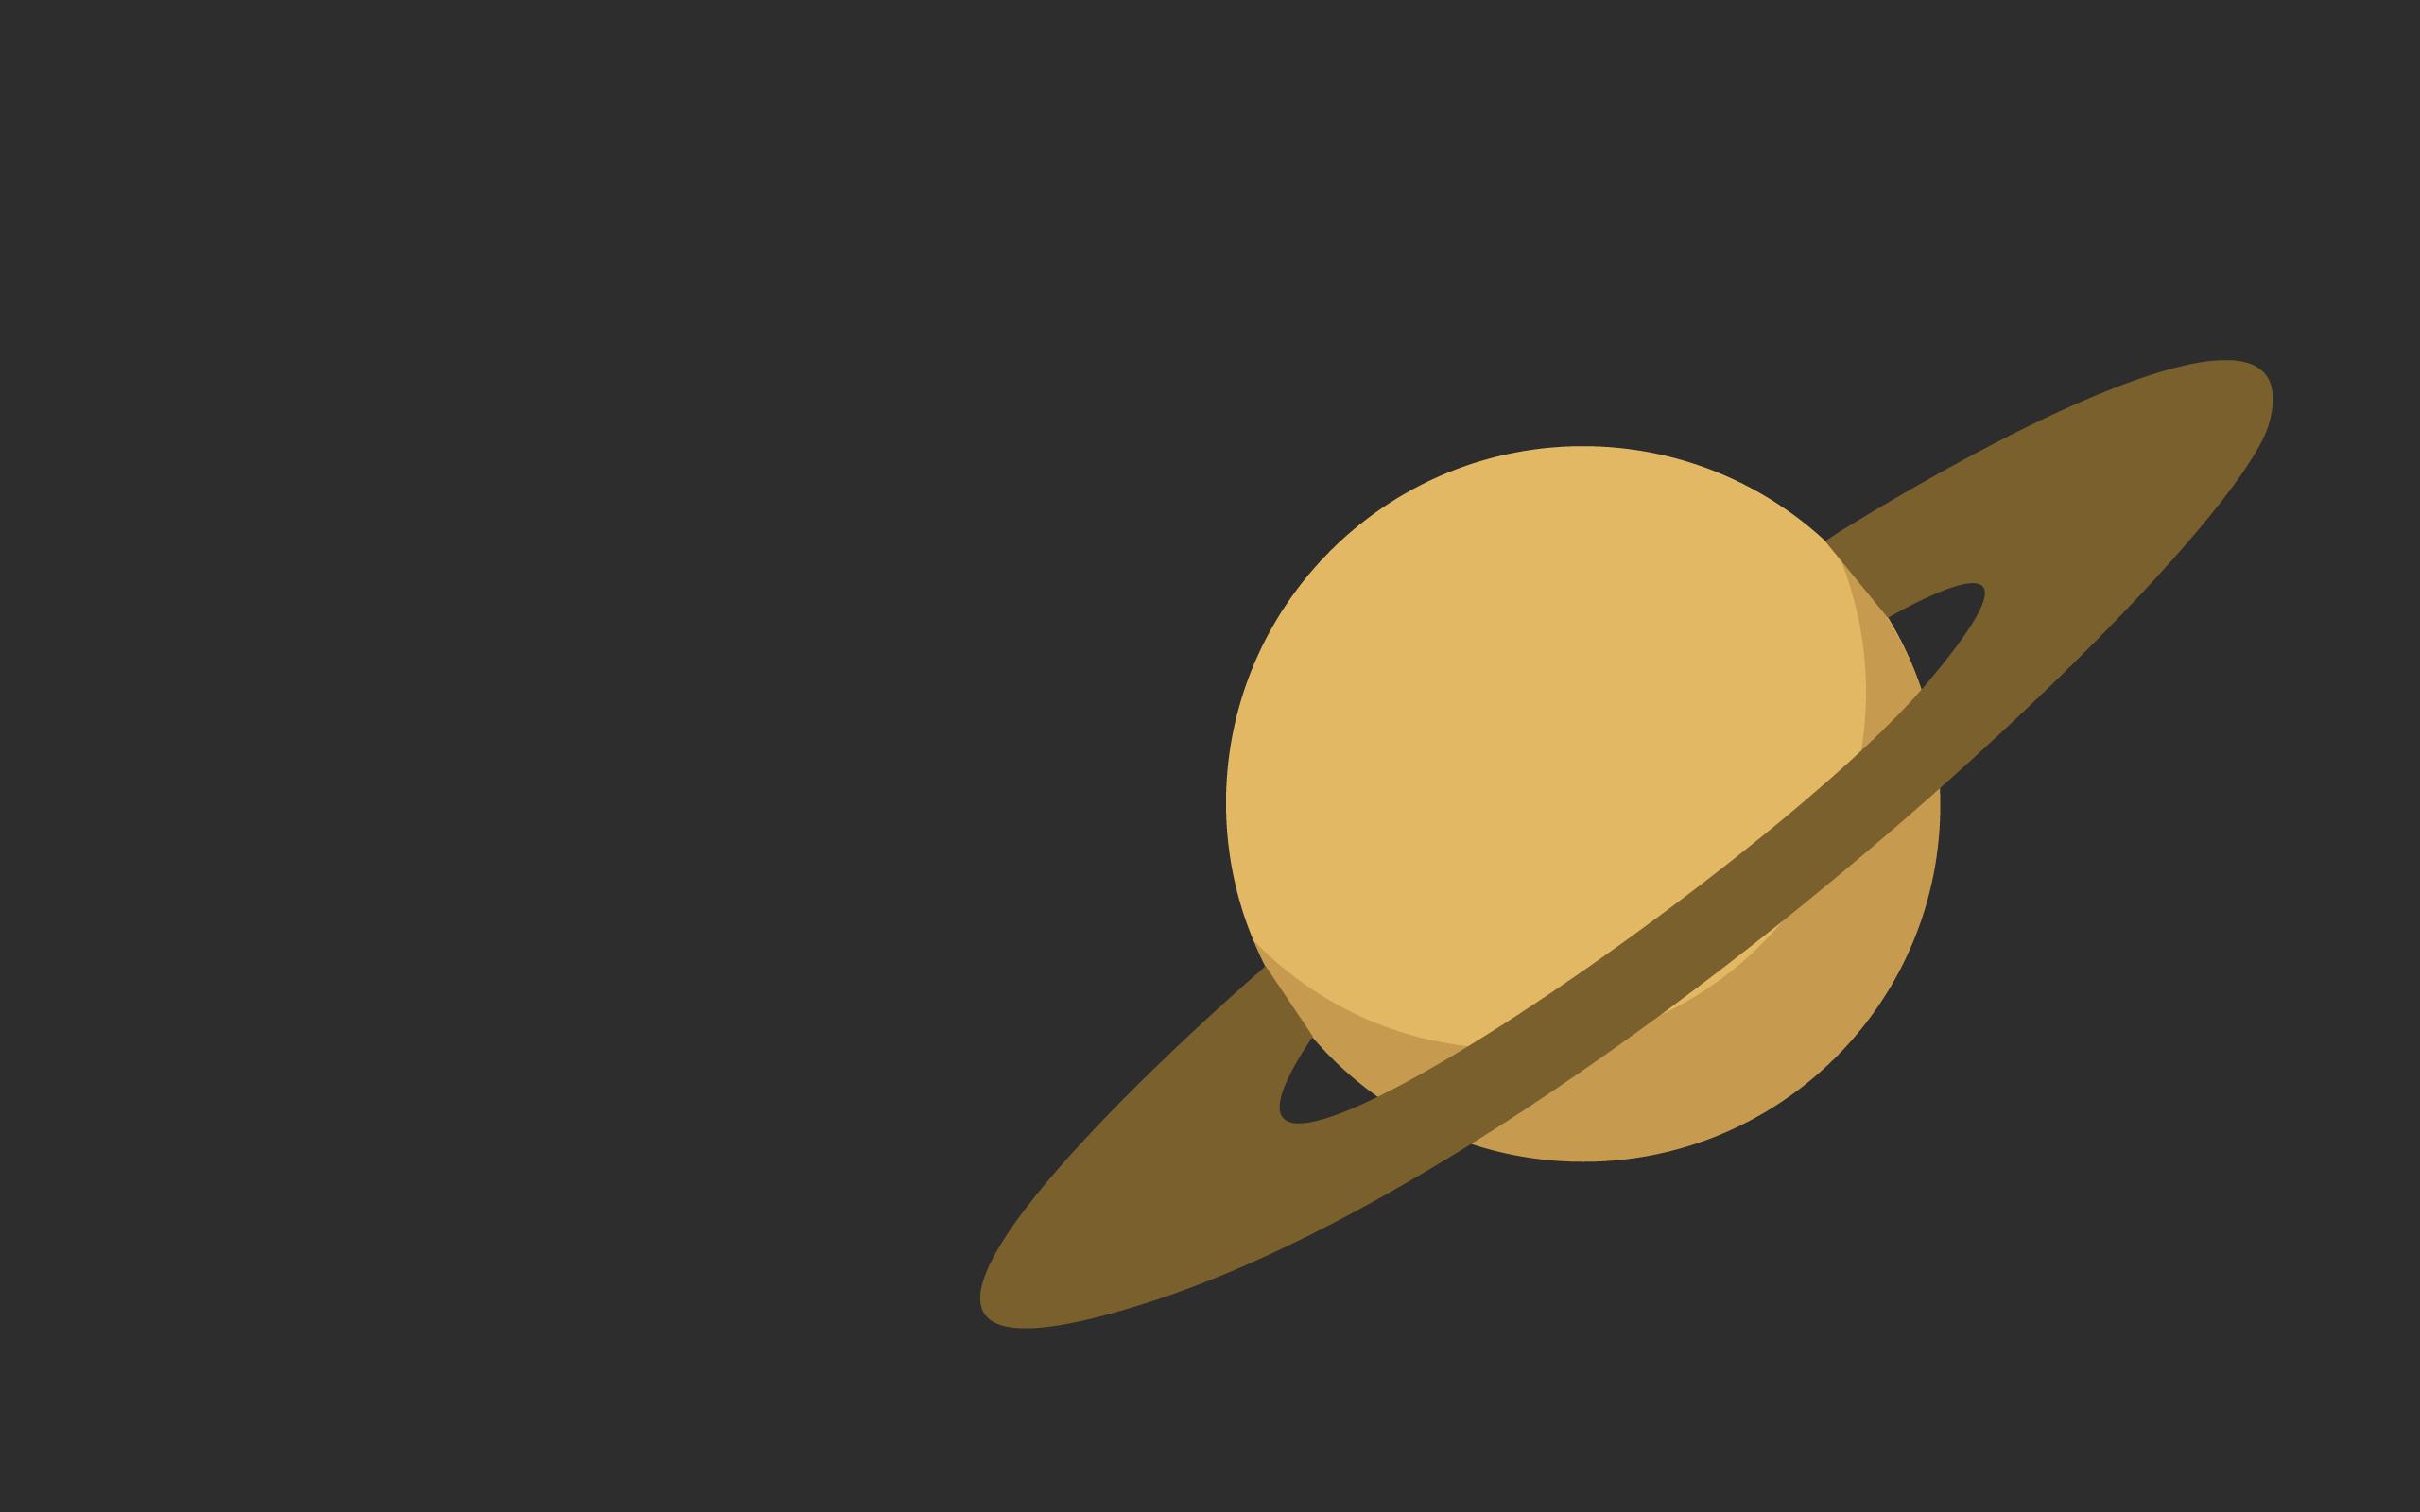 Vectors Space Minimalism Saturn Planet